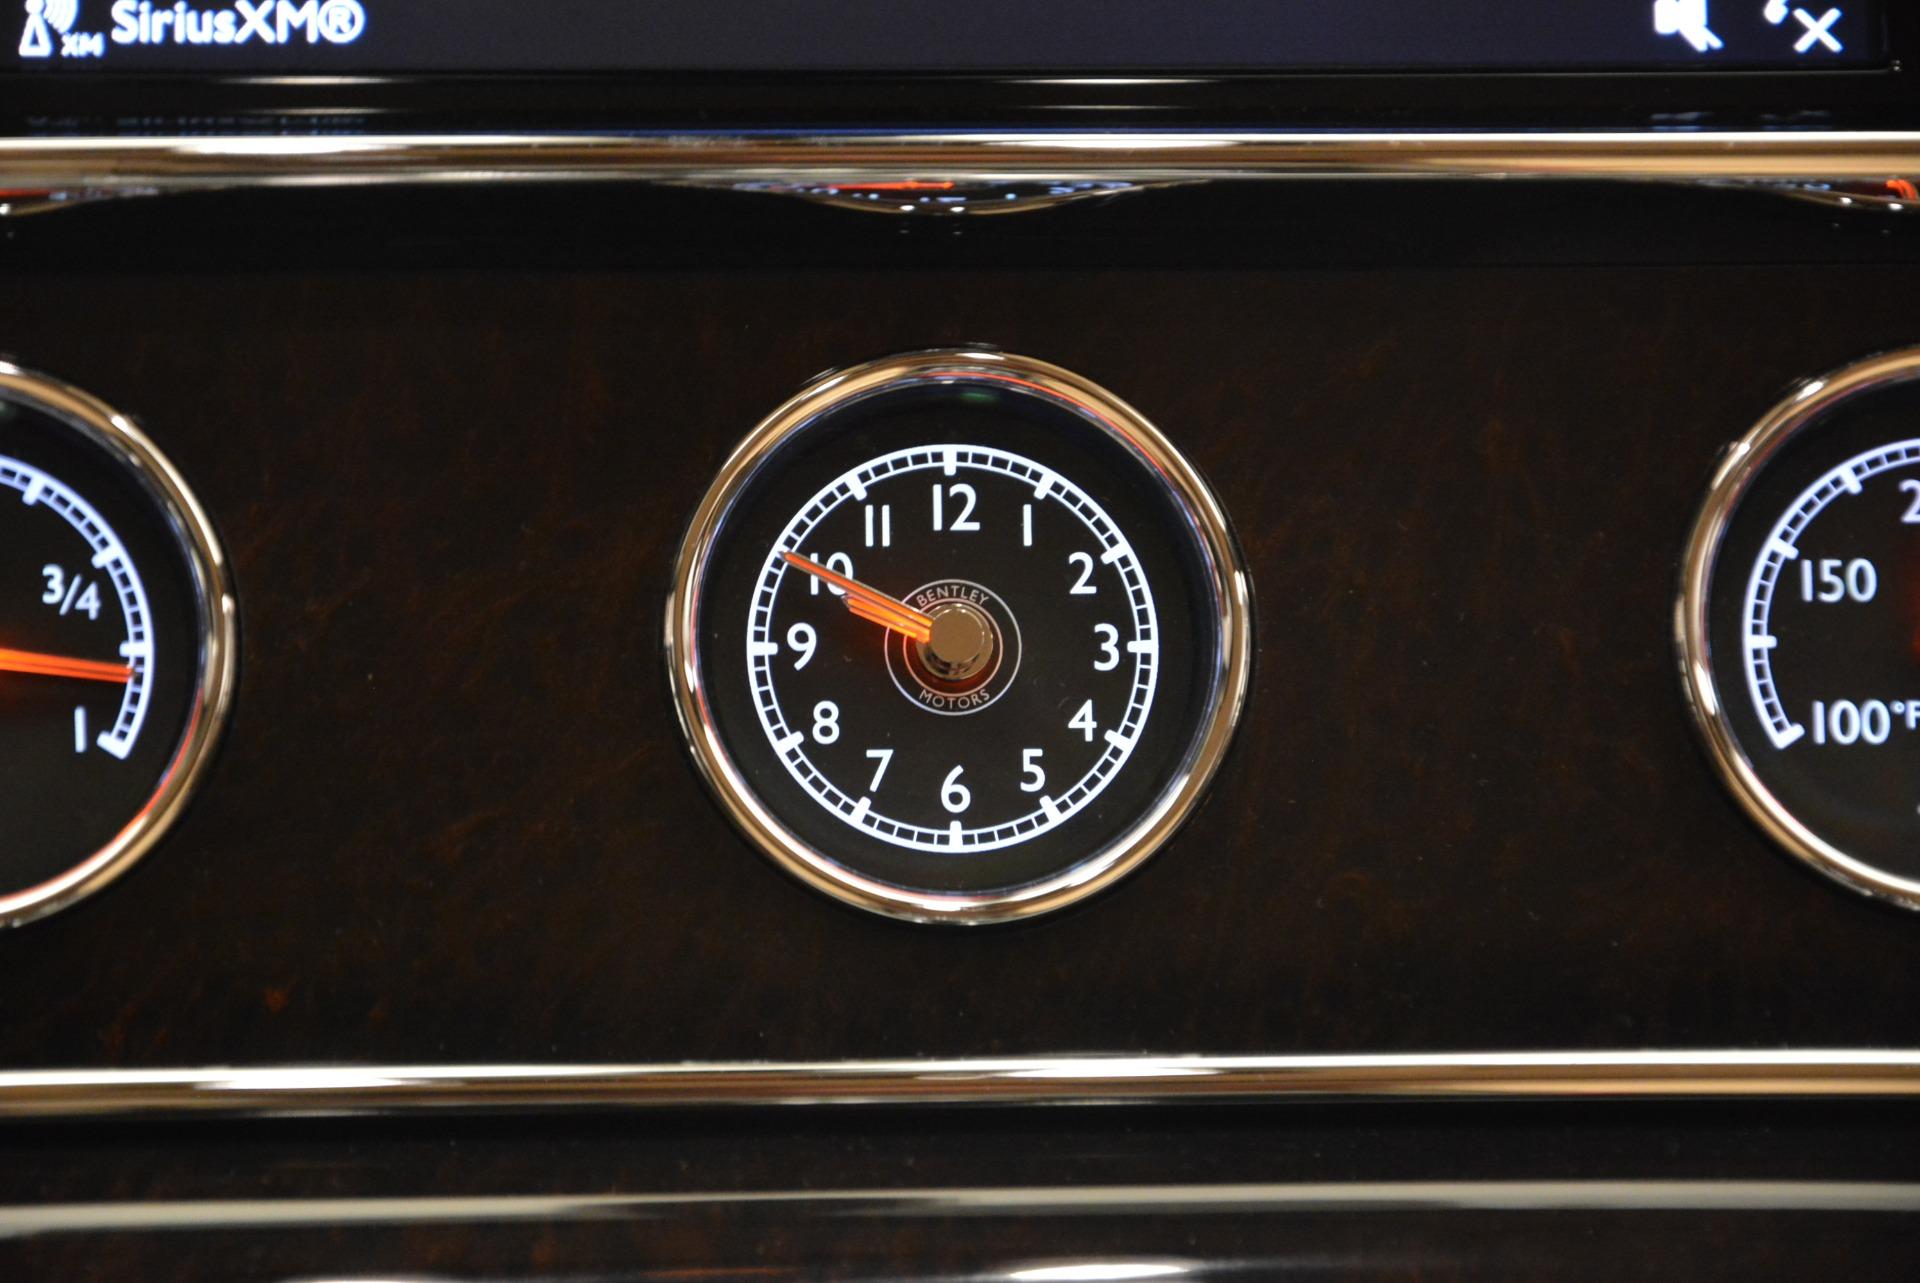 Used 2017 Bentley Mulsanne EWB For Sale In Greenwich, CT 1554_p16